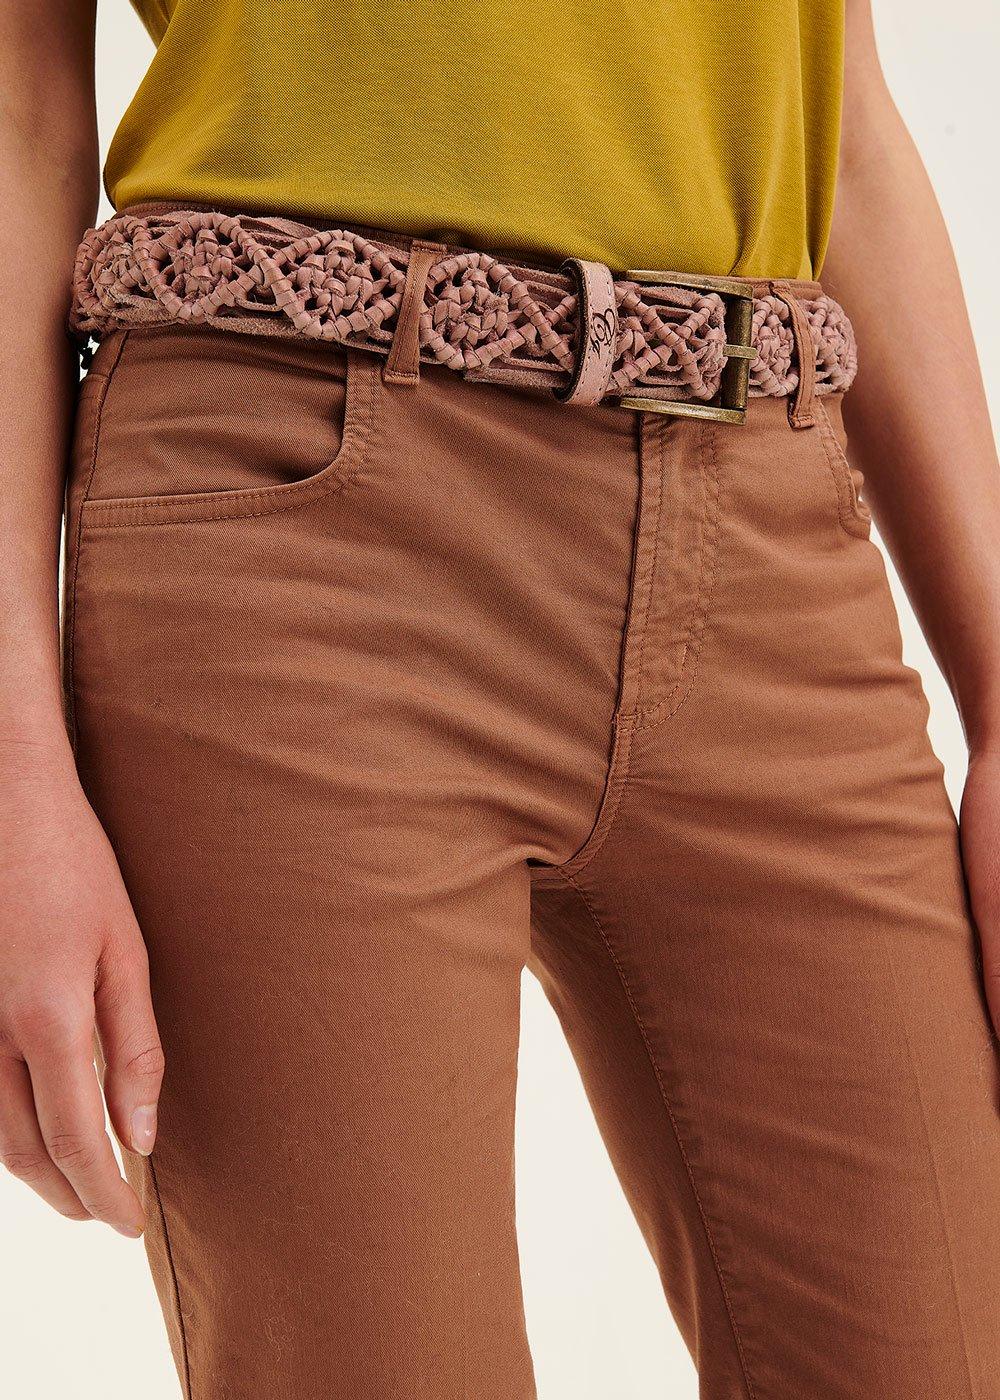 Carly genuine leather belt - Skin - Woman